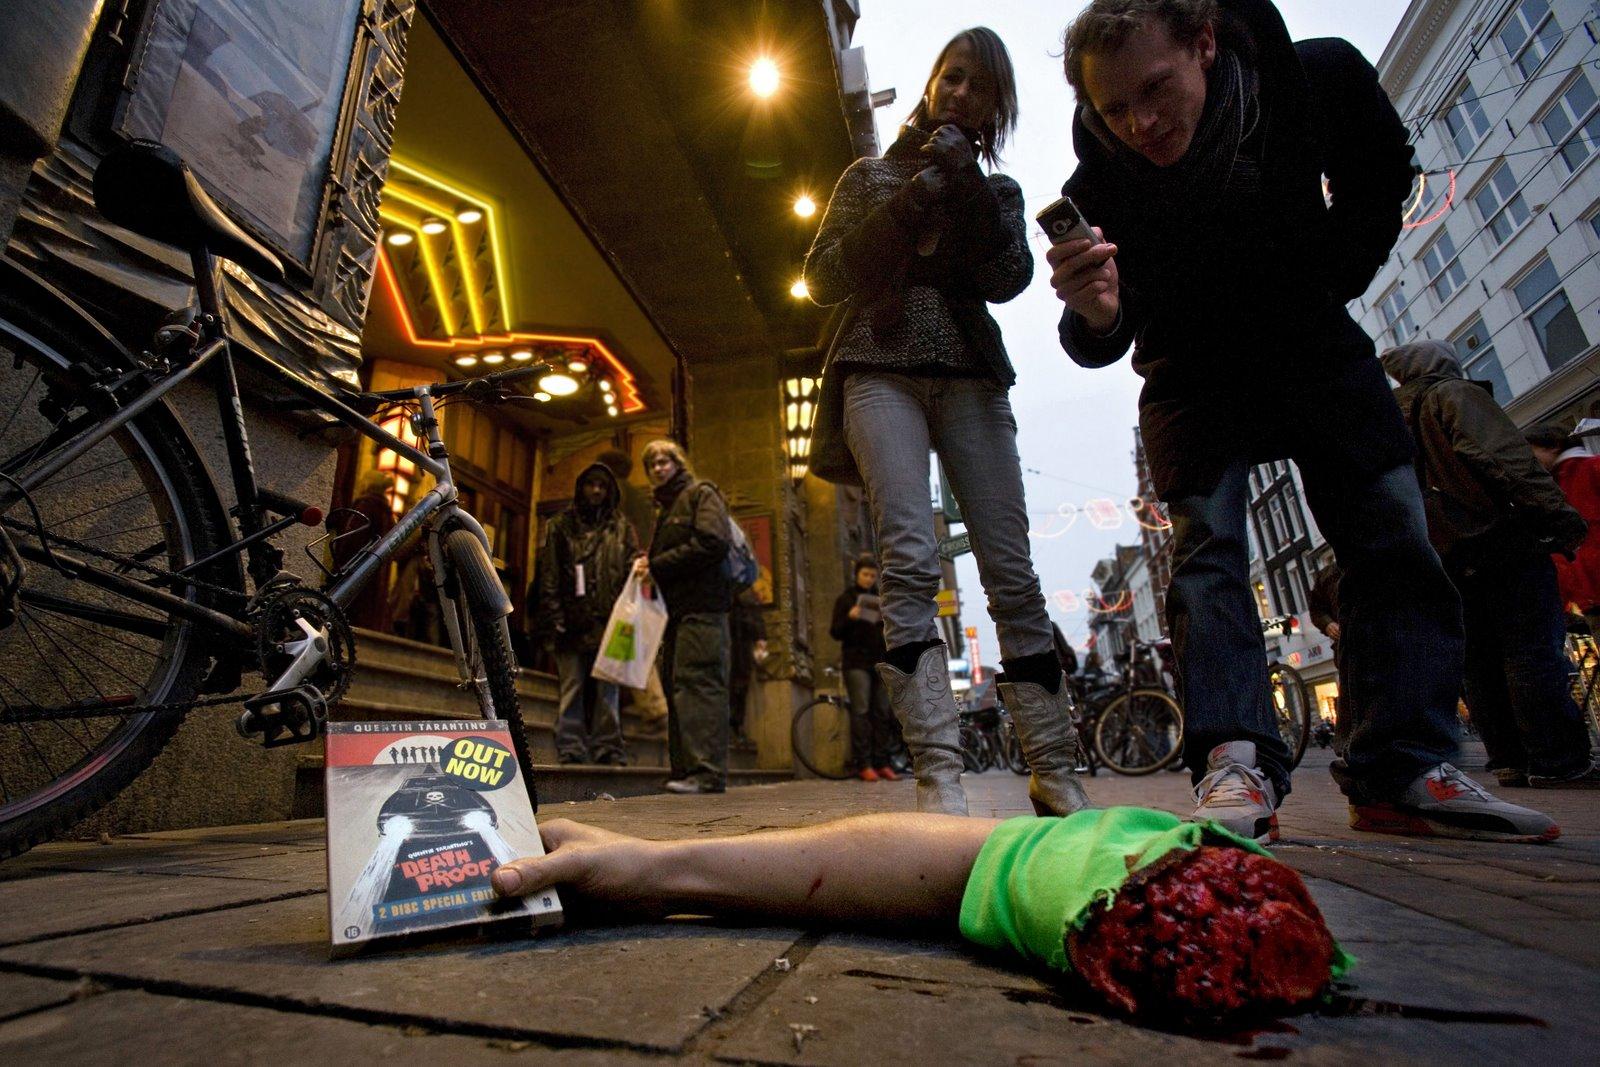 Tarantino Death Proof